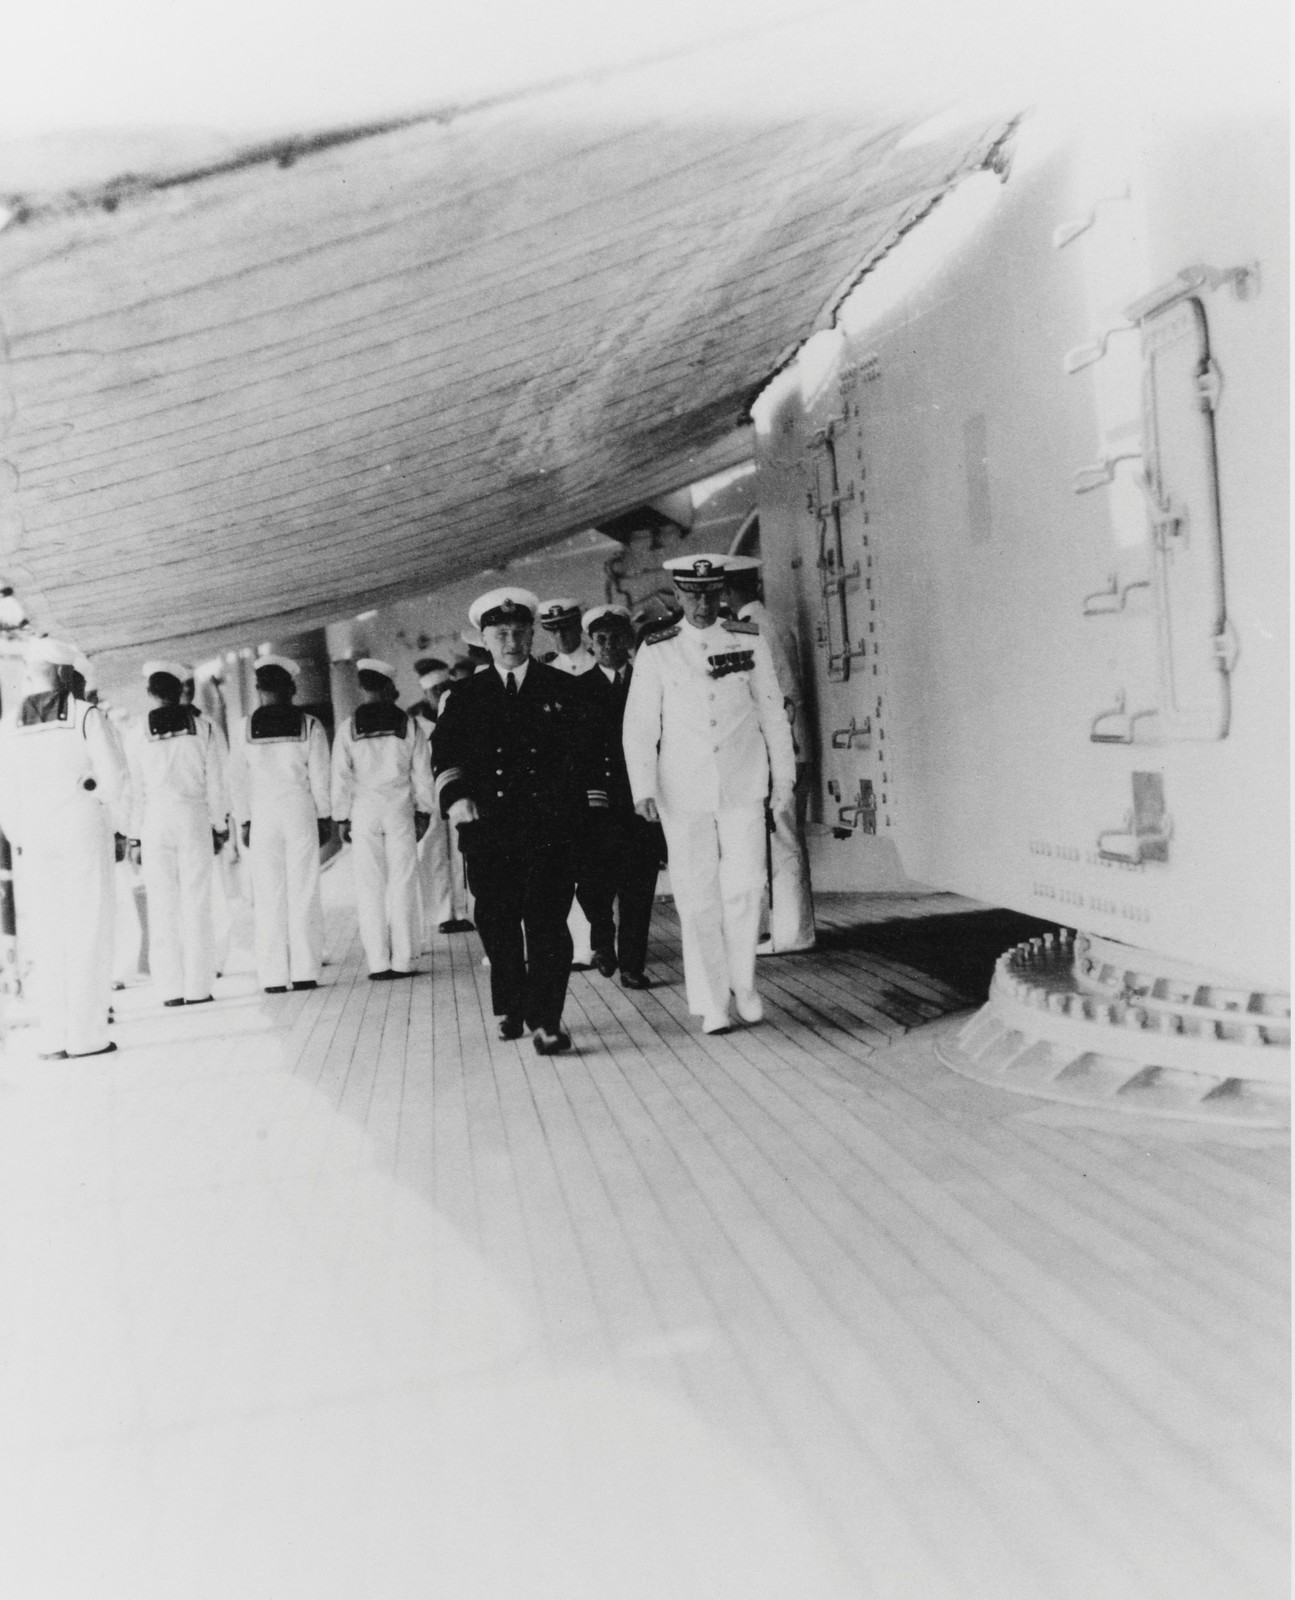 Адмирал Ярнелл и командующий Тихоокеанским флотом Г. Киреев  на борту «Огасты» 28 июля